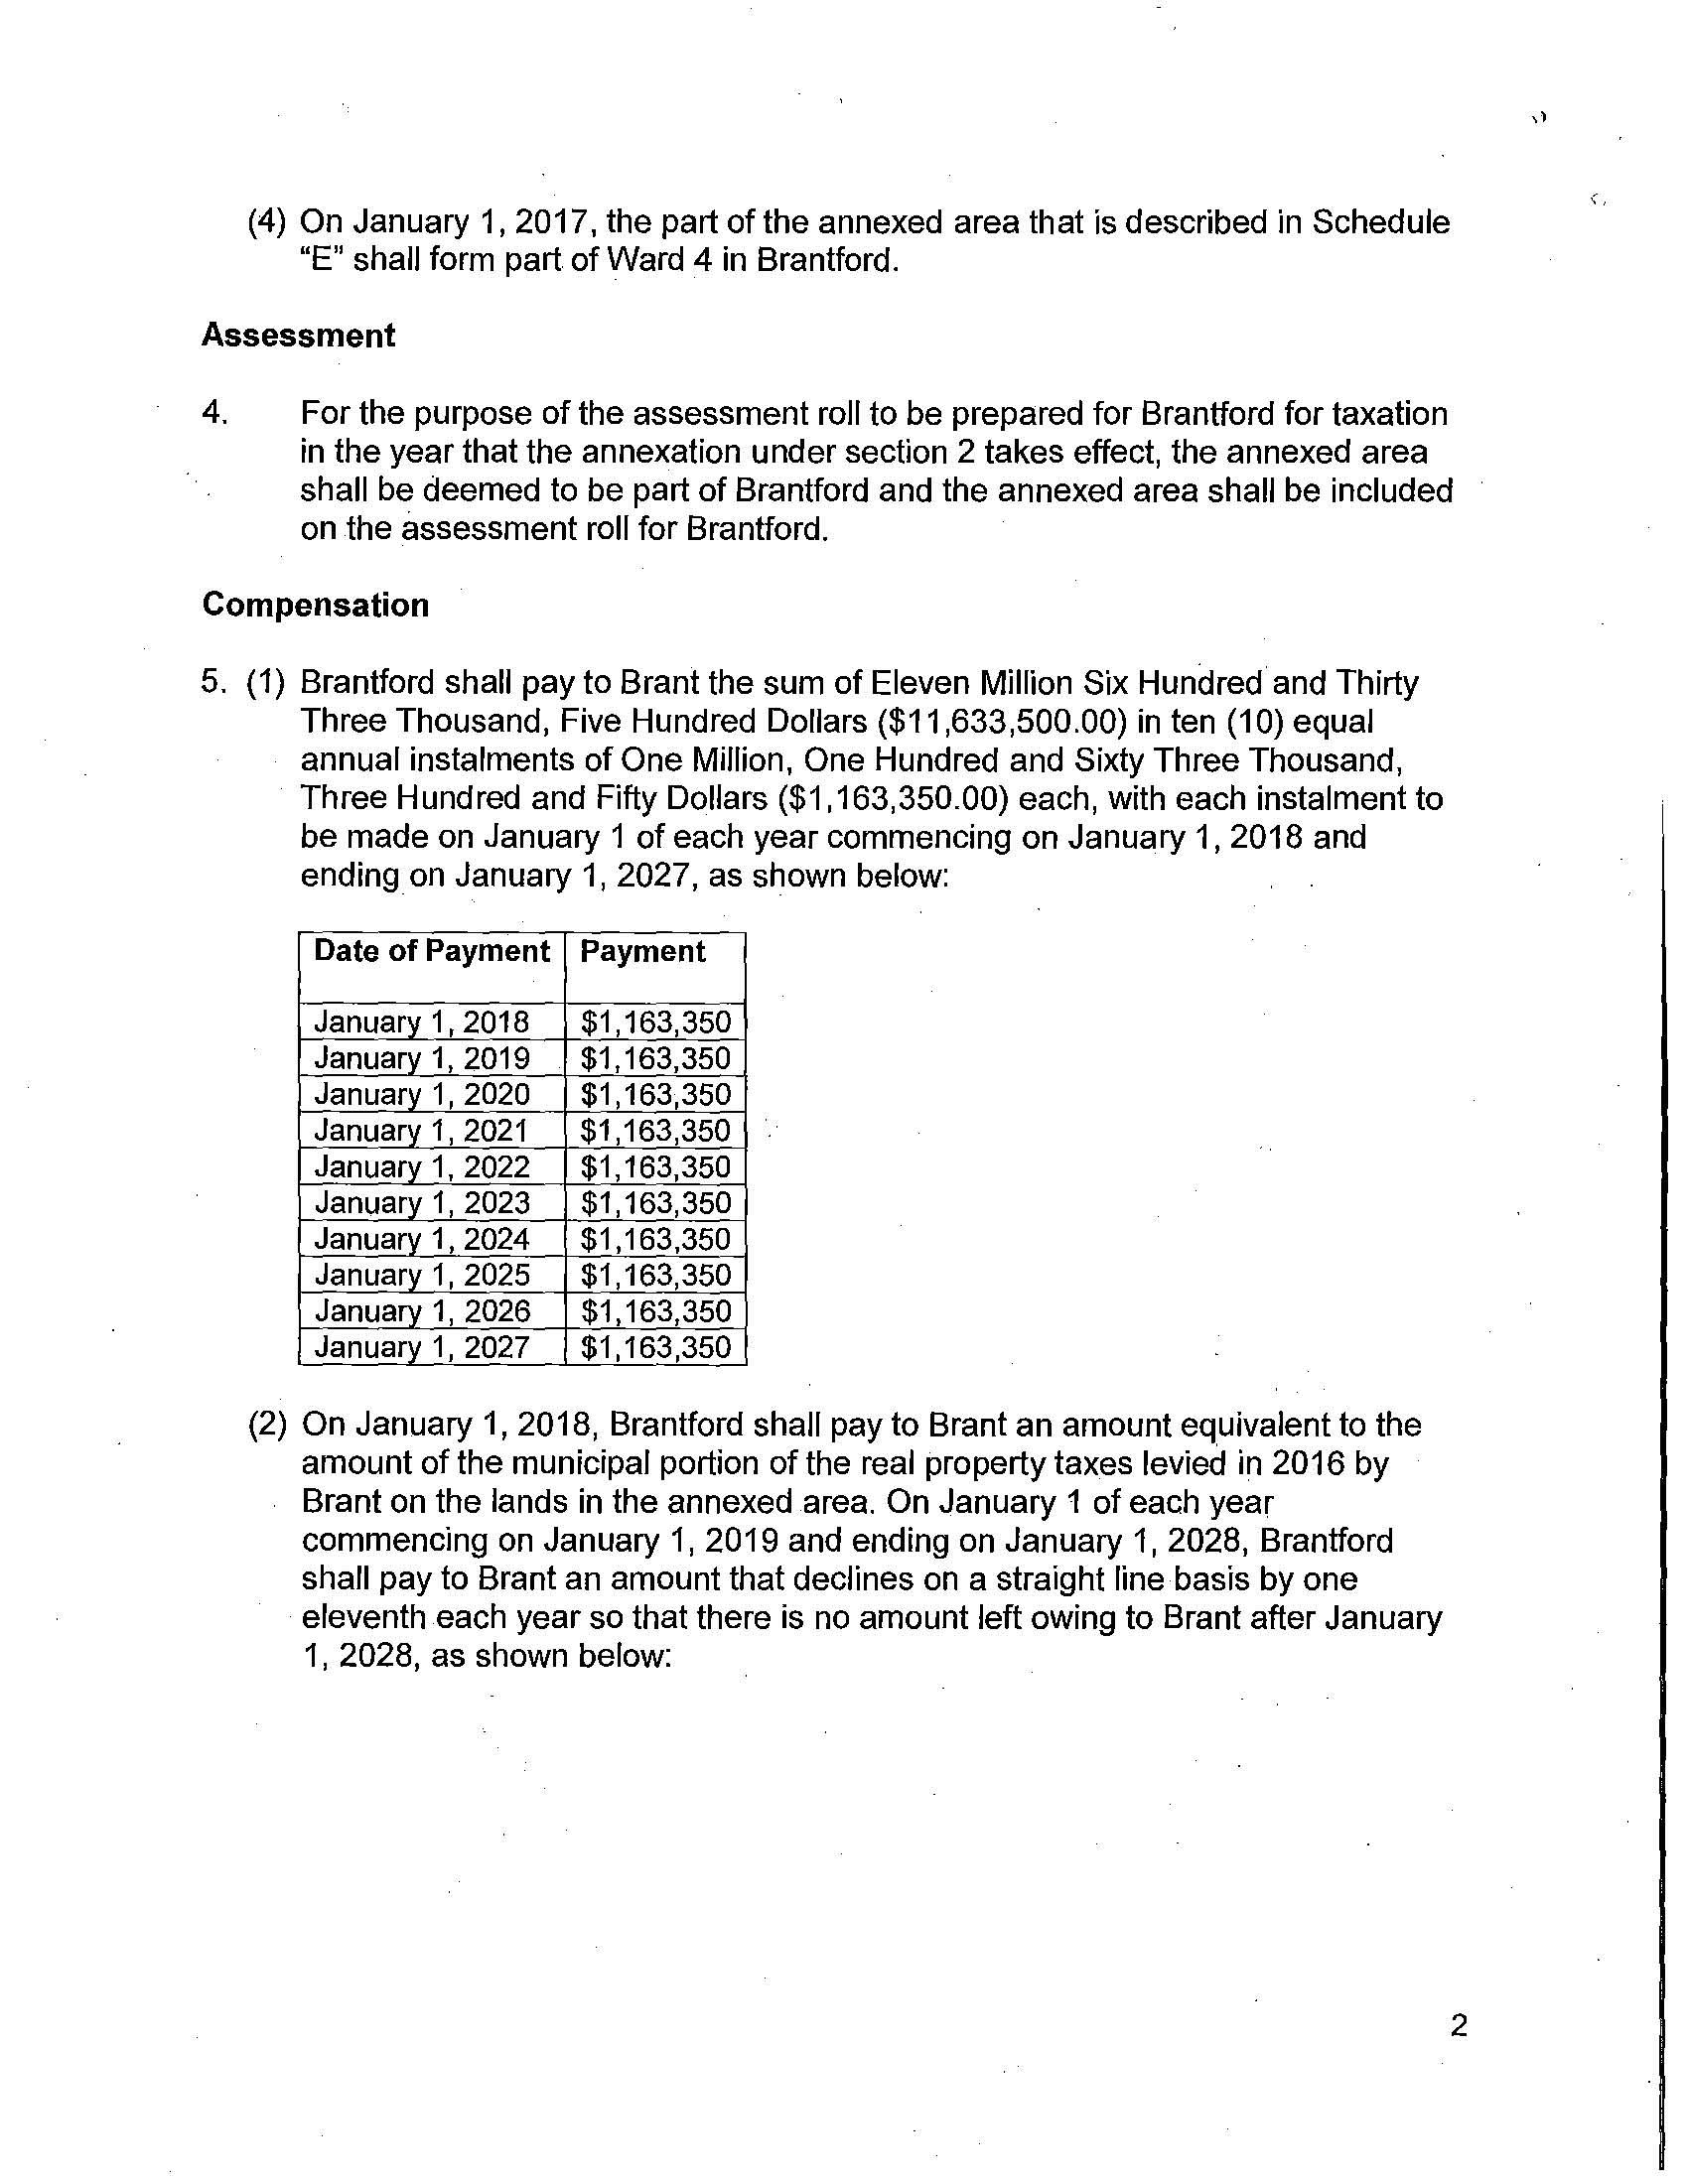 Brantford_Boundary_Signed_Order_Page_02.jpg